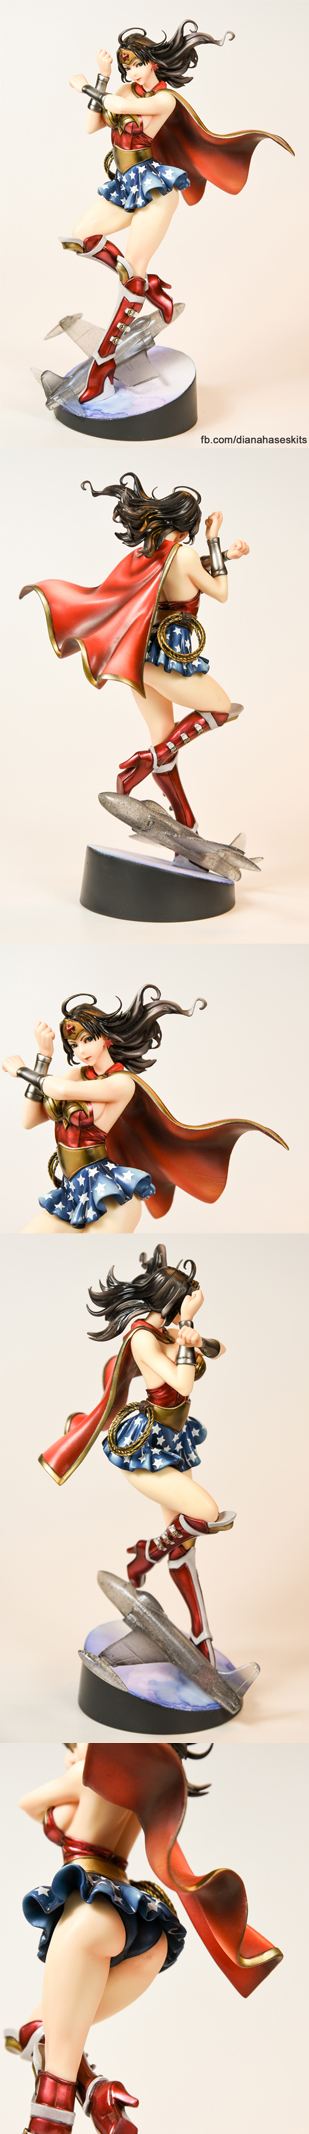 Shunya's Wonder Woman by dianahase by dianahase